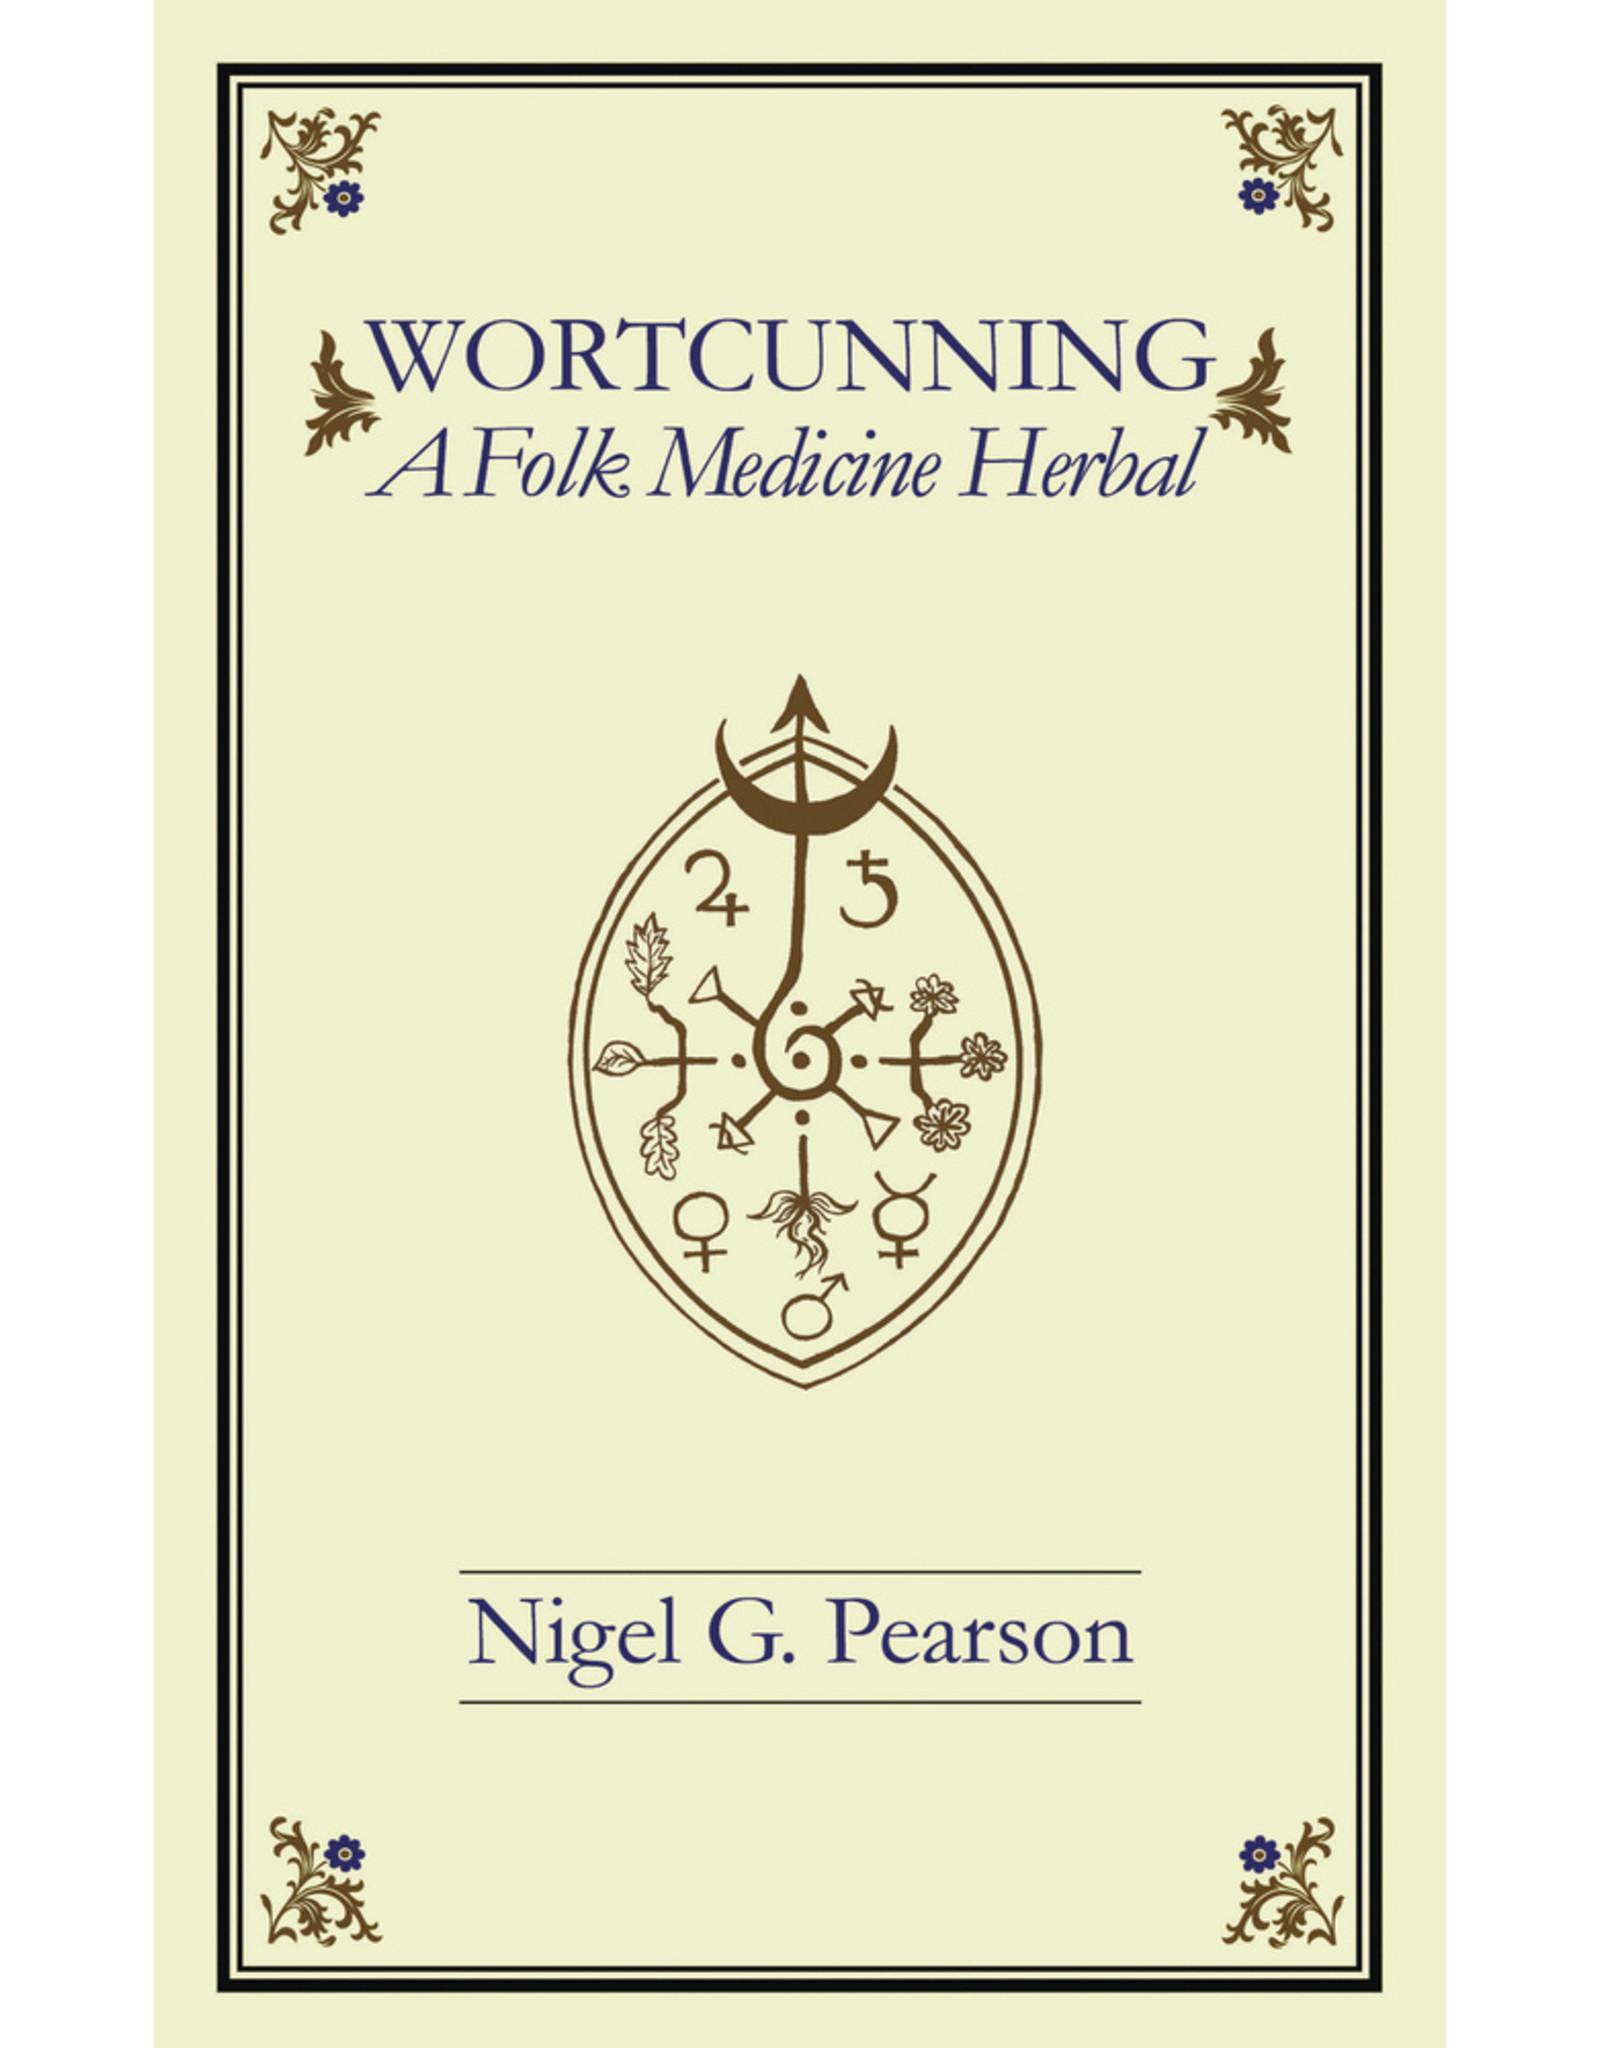 Wortcunning: A Folk Medicine Herbal